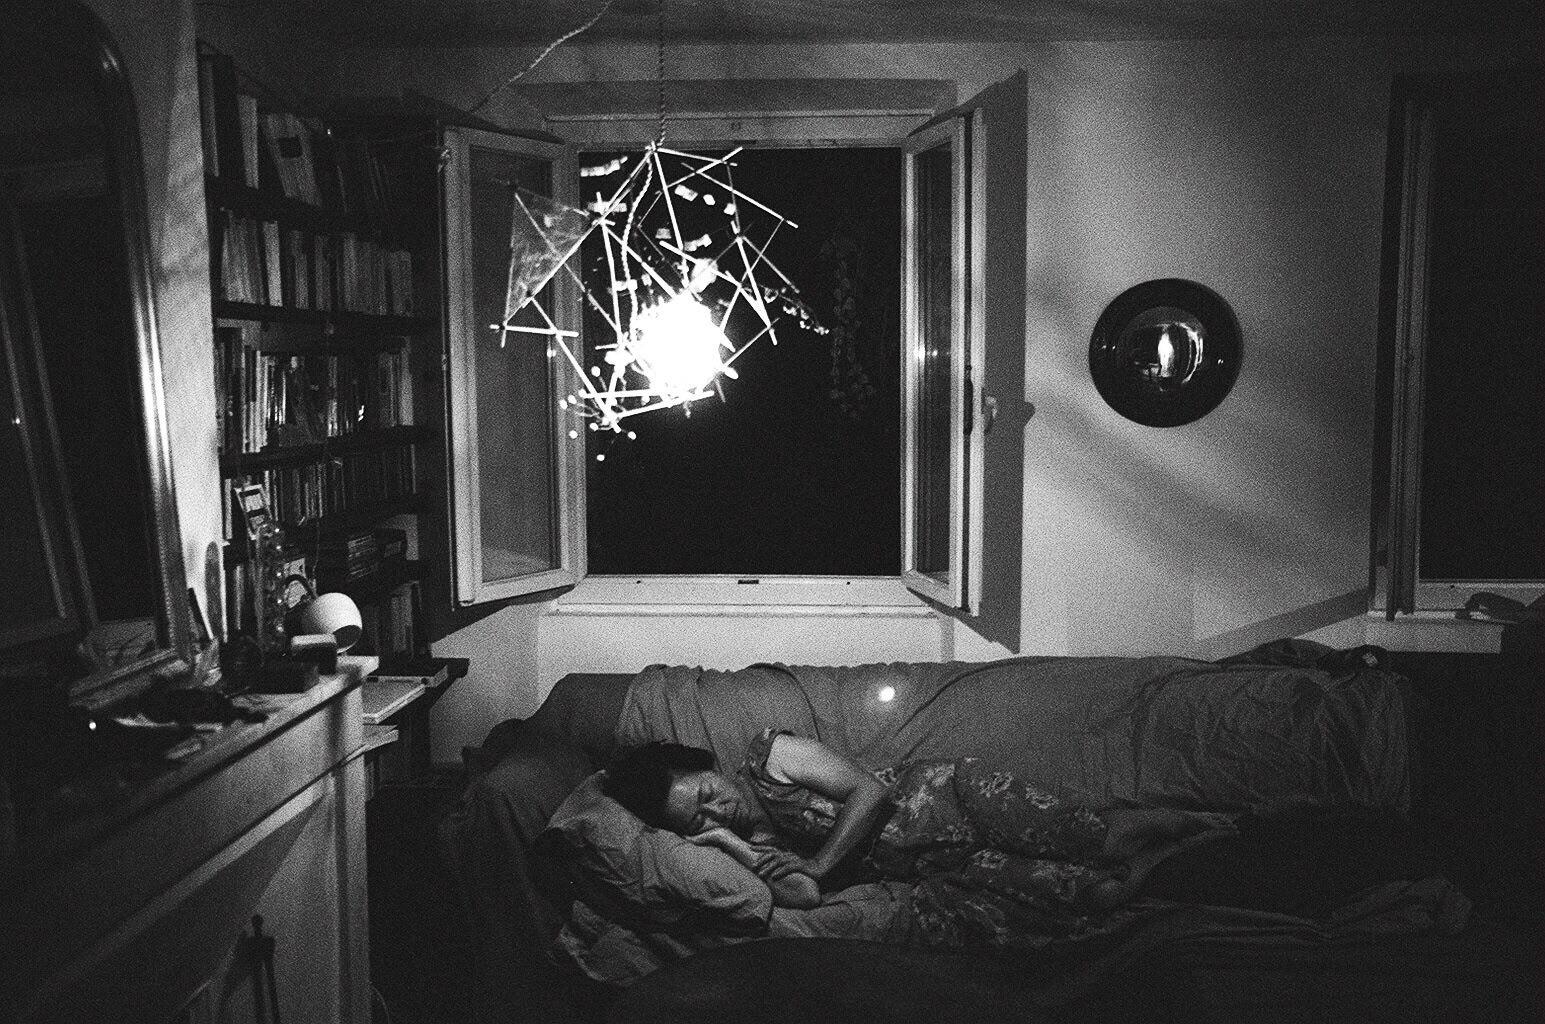 eric kim photography black and white tri x 1600 leica mp 35mm film-1093